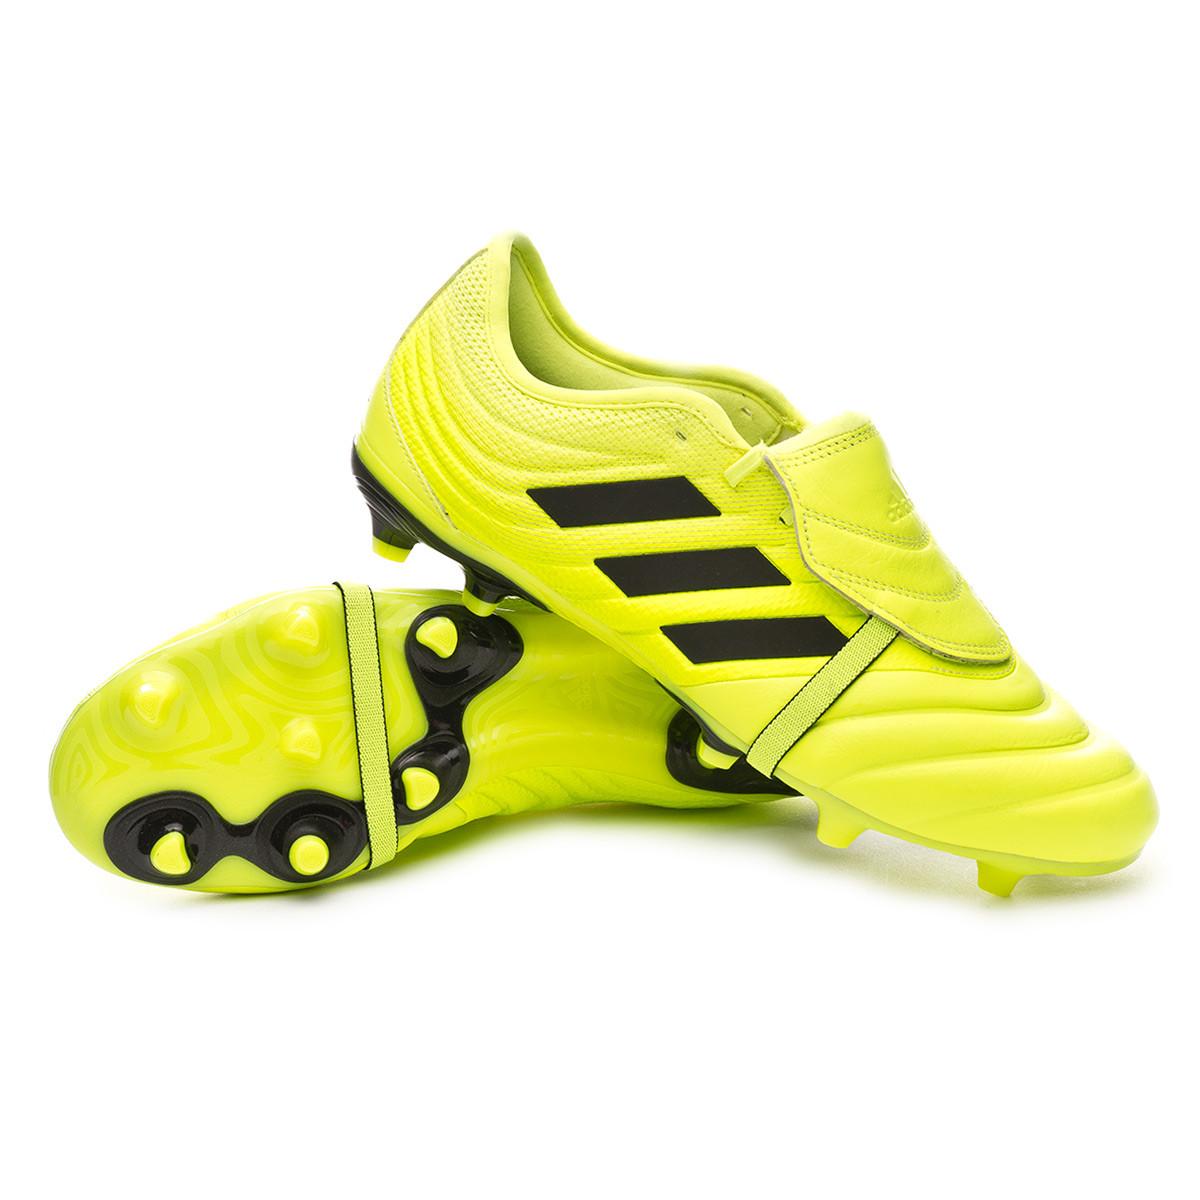 sin Árbol código Morse  Football Boots adidas Copa Gloro 19.2 FG Solar yellow-Core black-Solar  yellow - Football store Fútbol Emotion